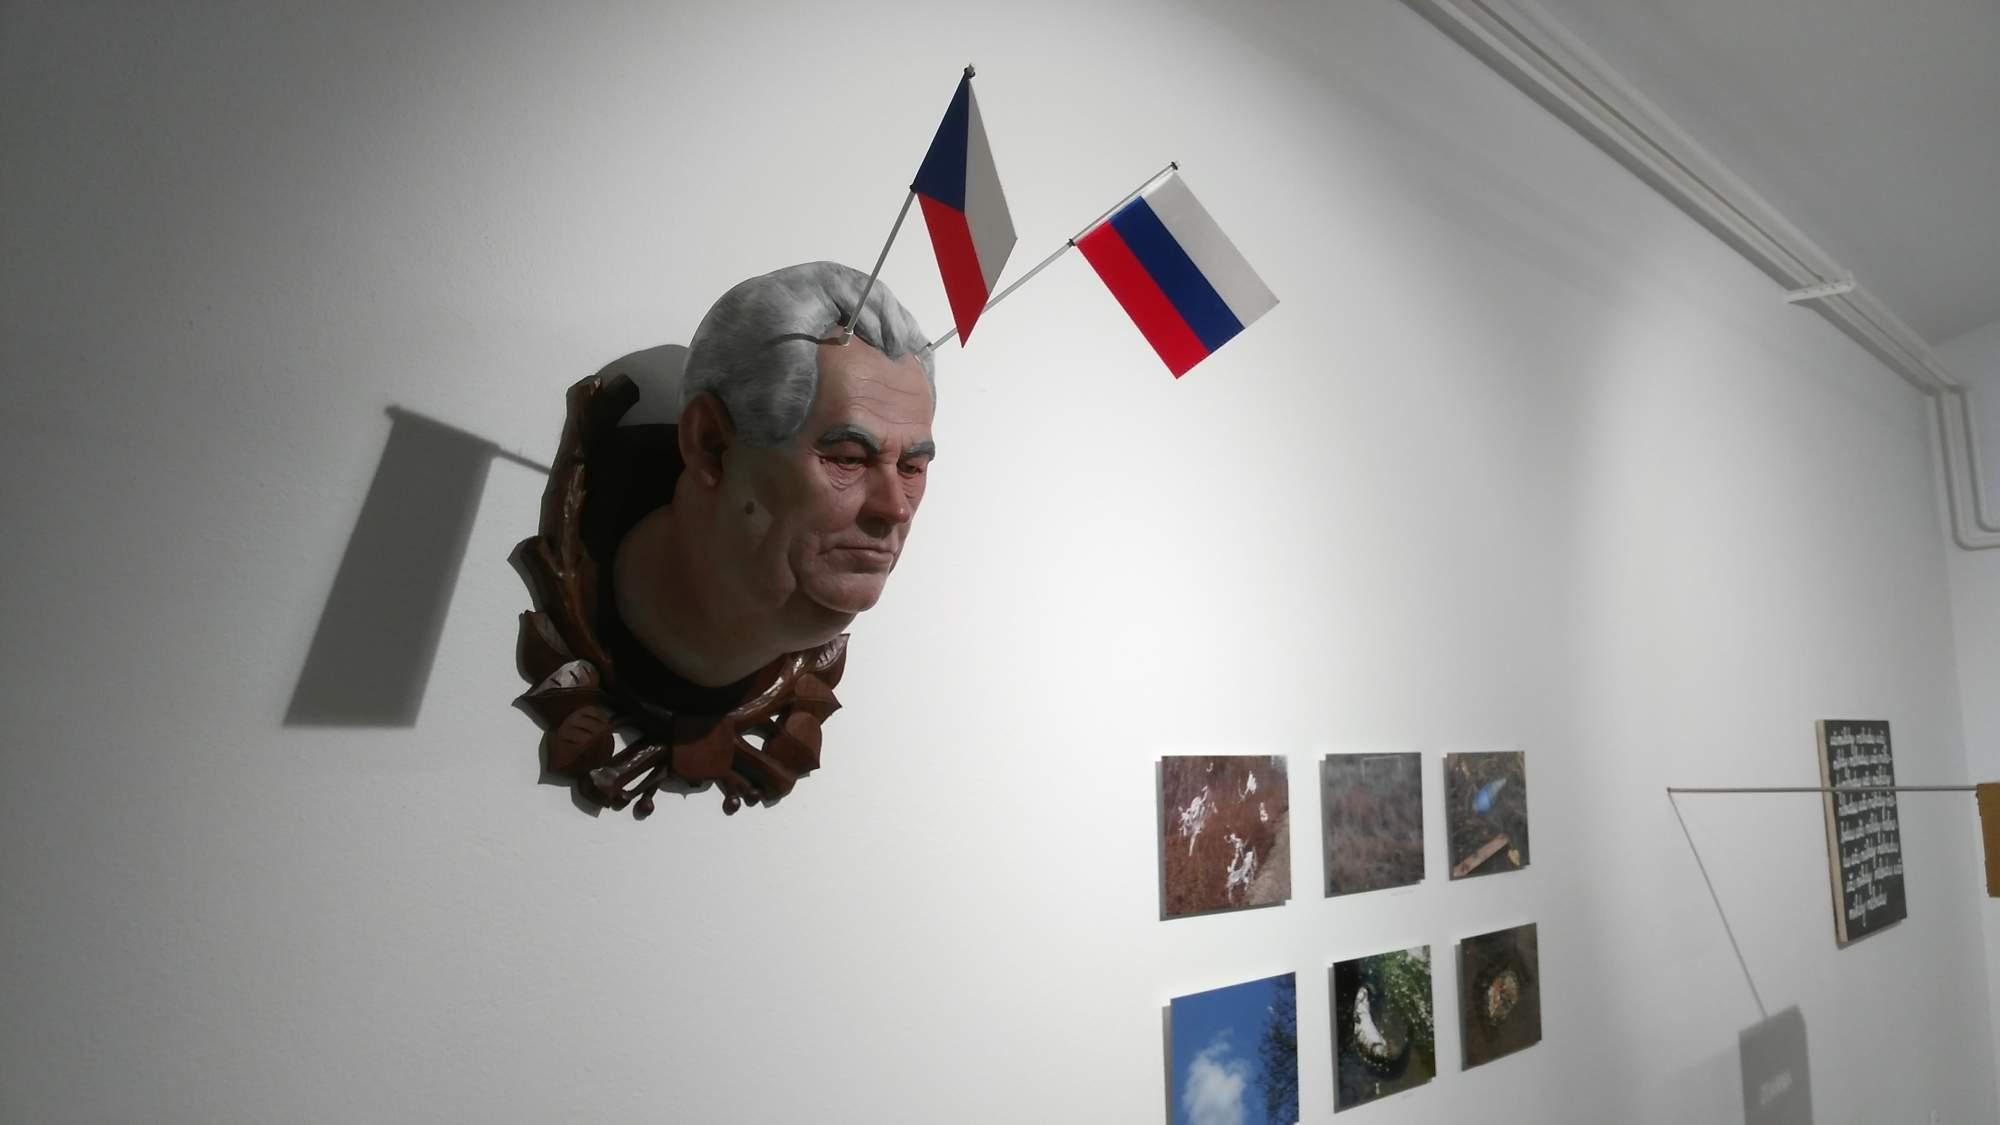 Bysta prezidenta Miloše Zemana. | FOTO: Marie Mrázová